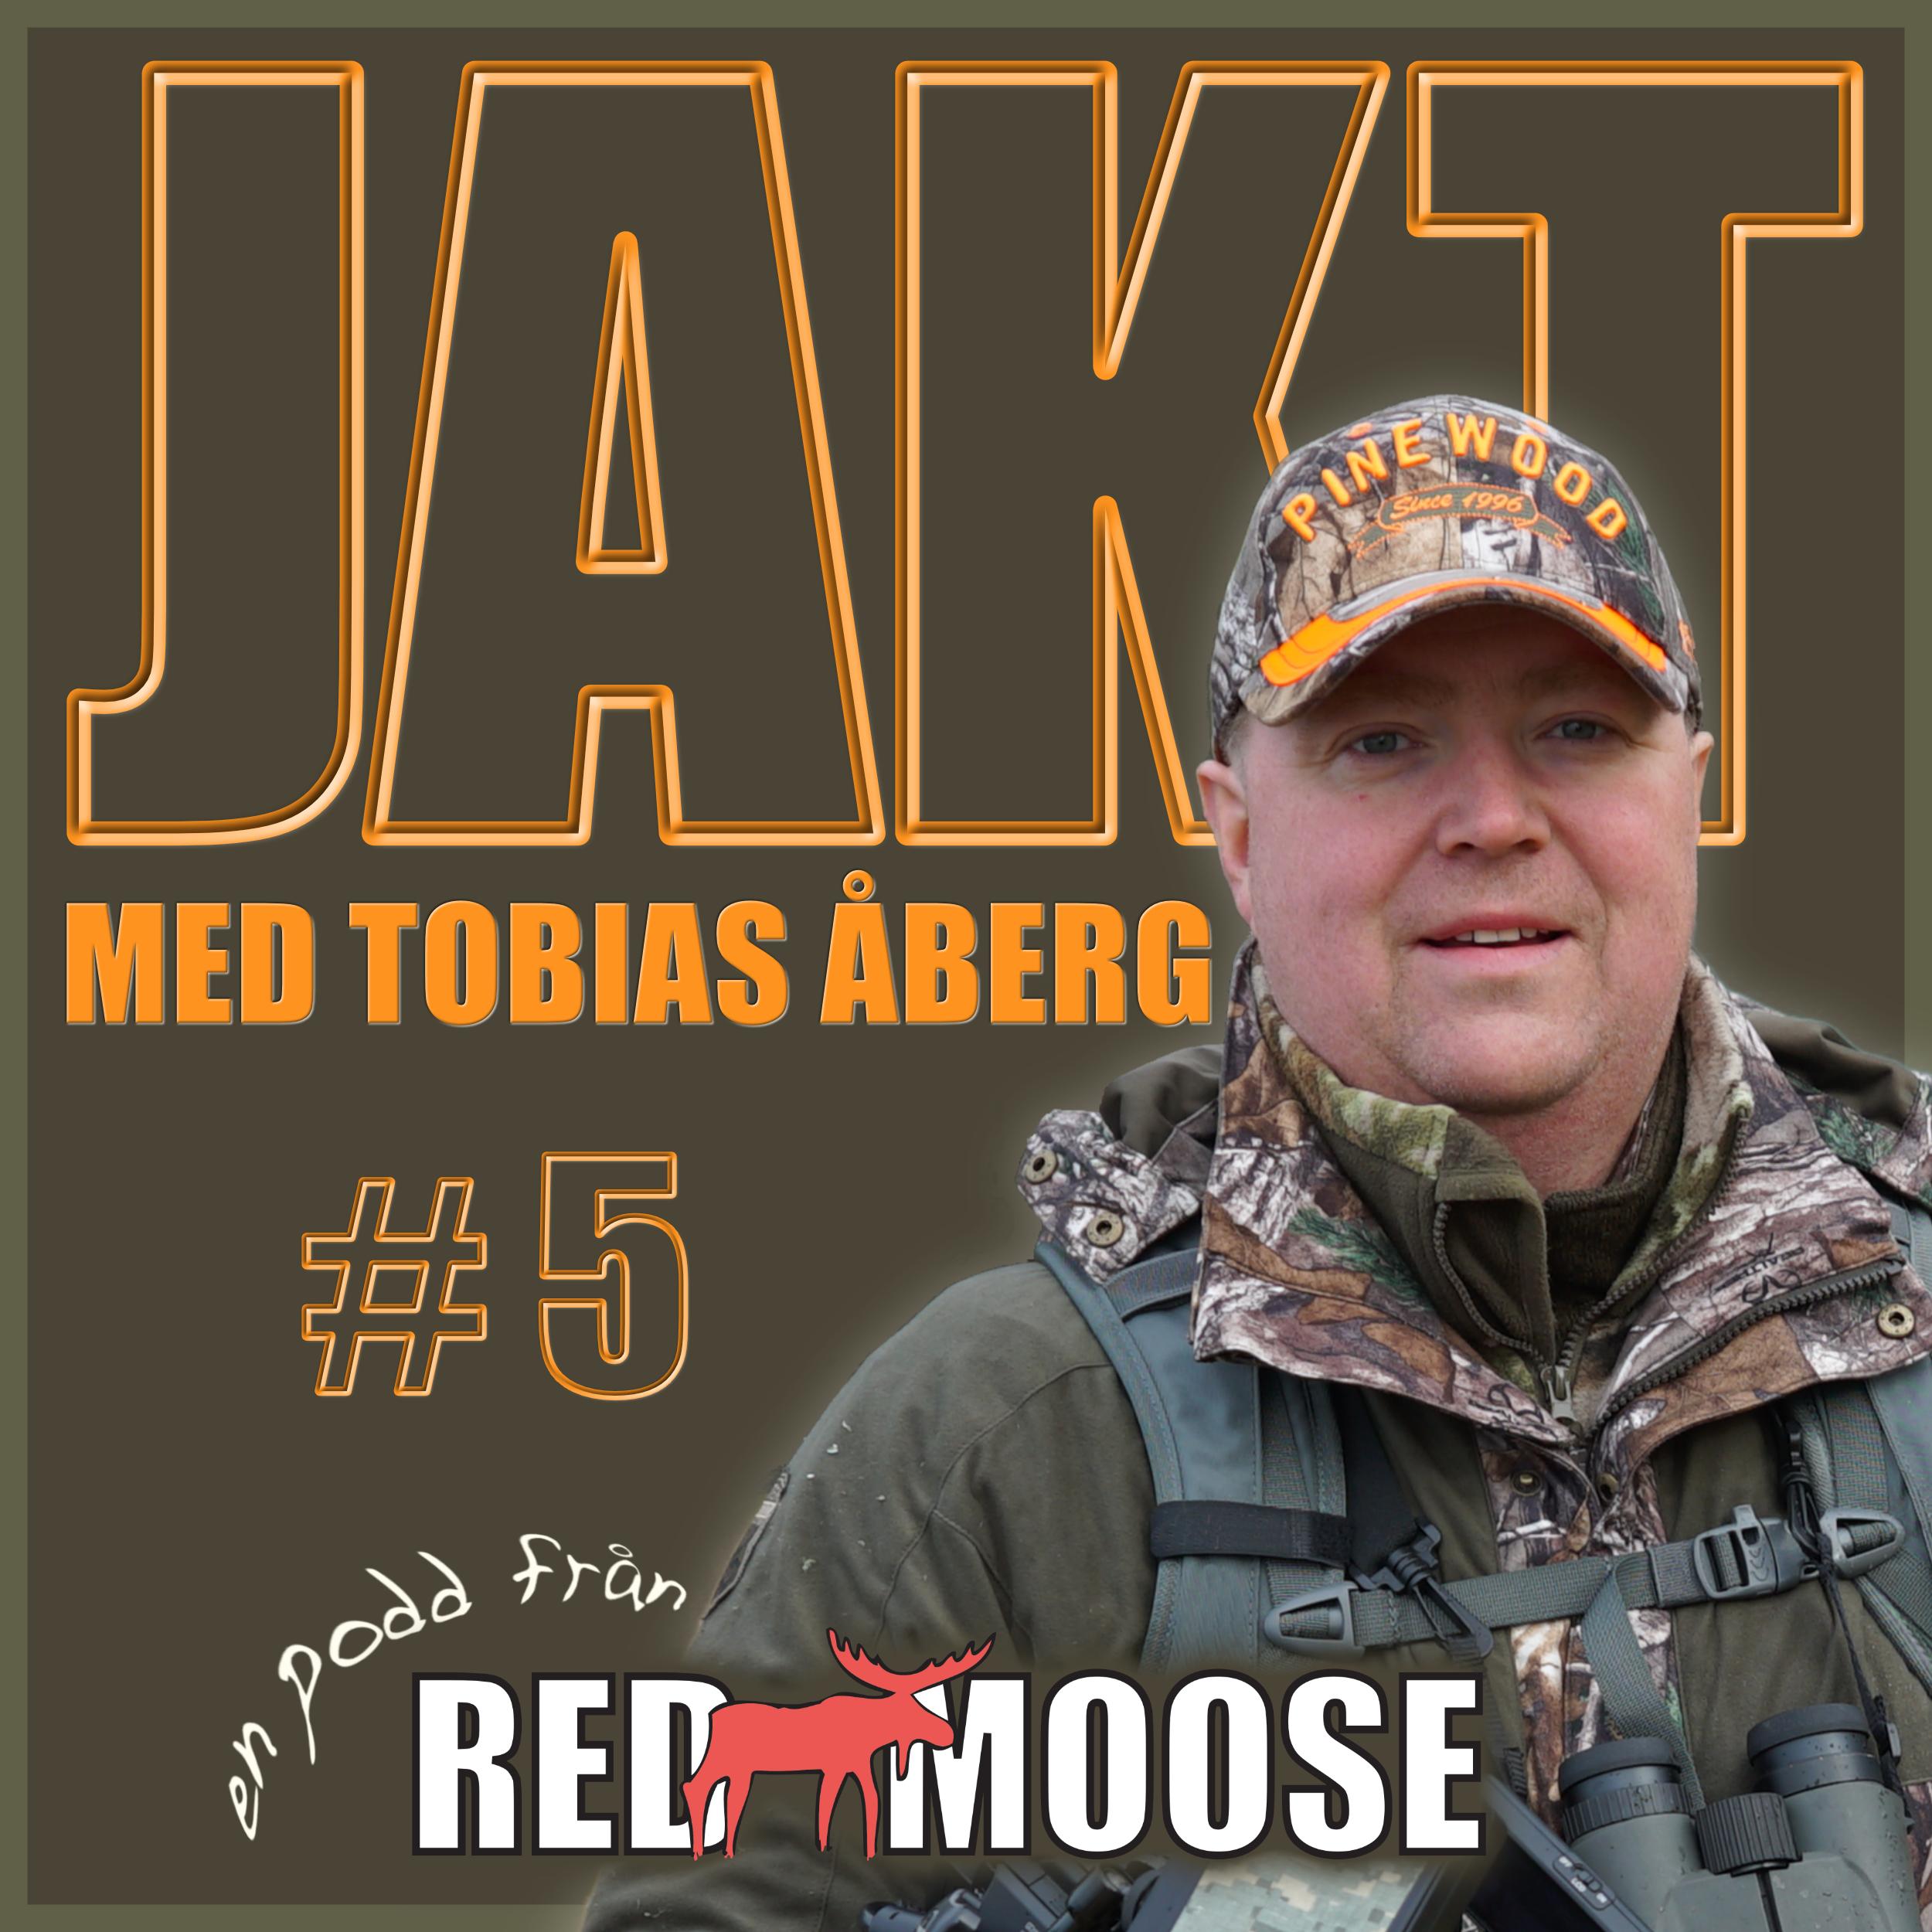 JAKT #5: Effektivare jakt och utfodring med Carl Pfeiff